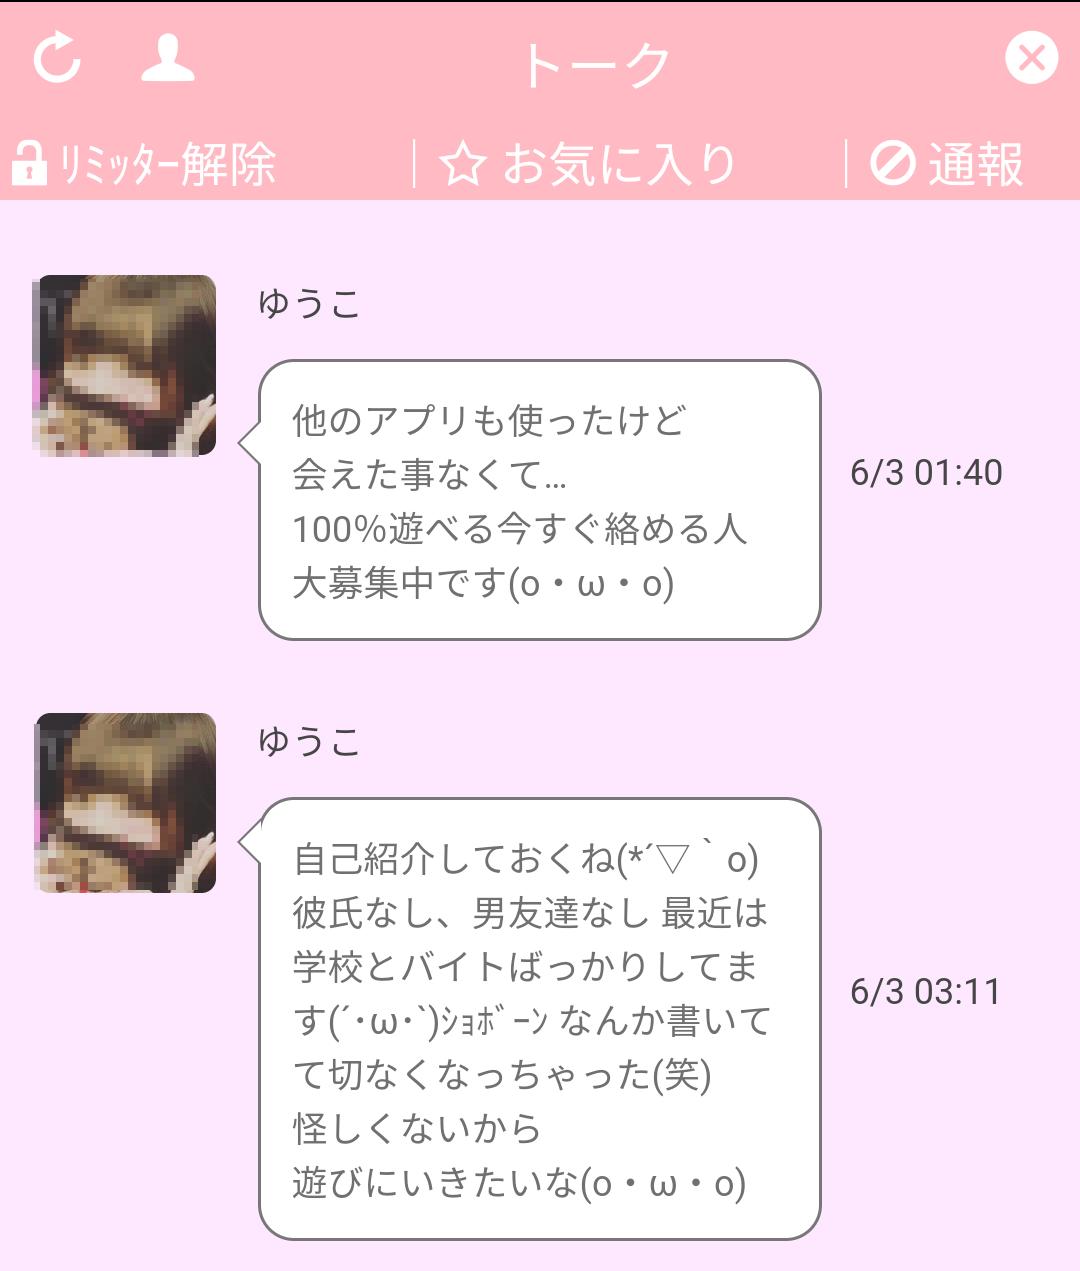 yaritori4 - 「ラブりんトーク」はサクラ詐欺アプリ!